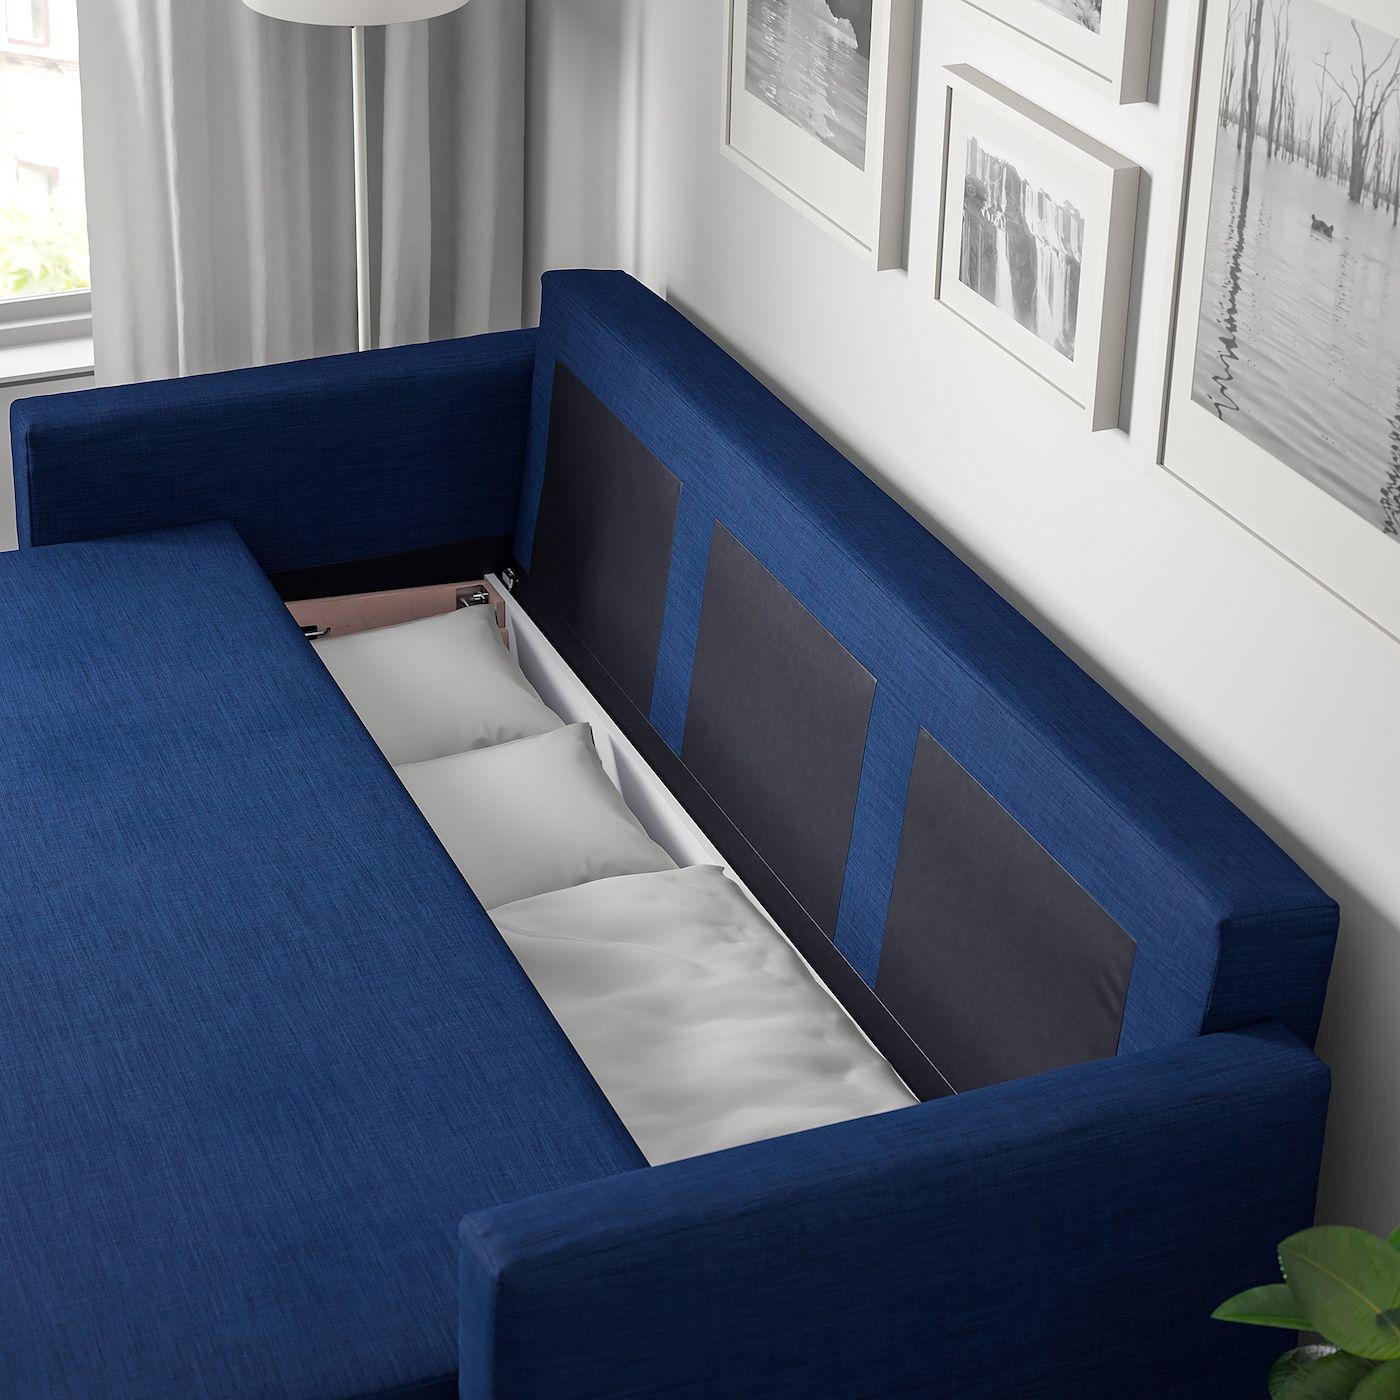 Ikea Friheten Skiftebo Blue Sleeper Sofa In 2020 Sleeper Sofa